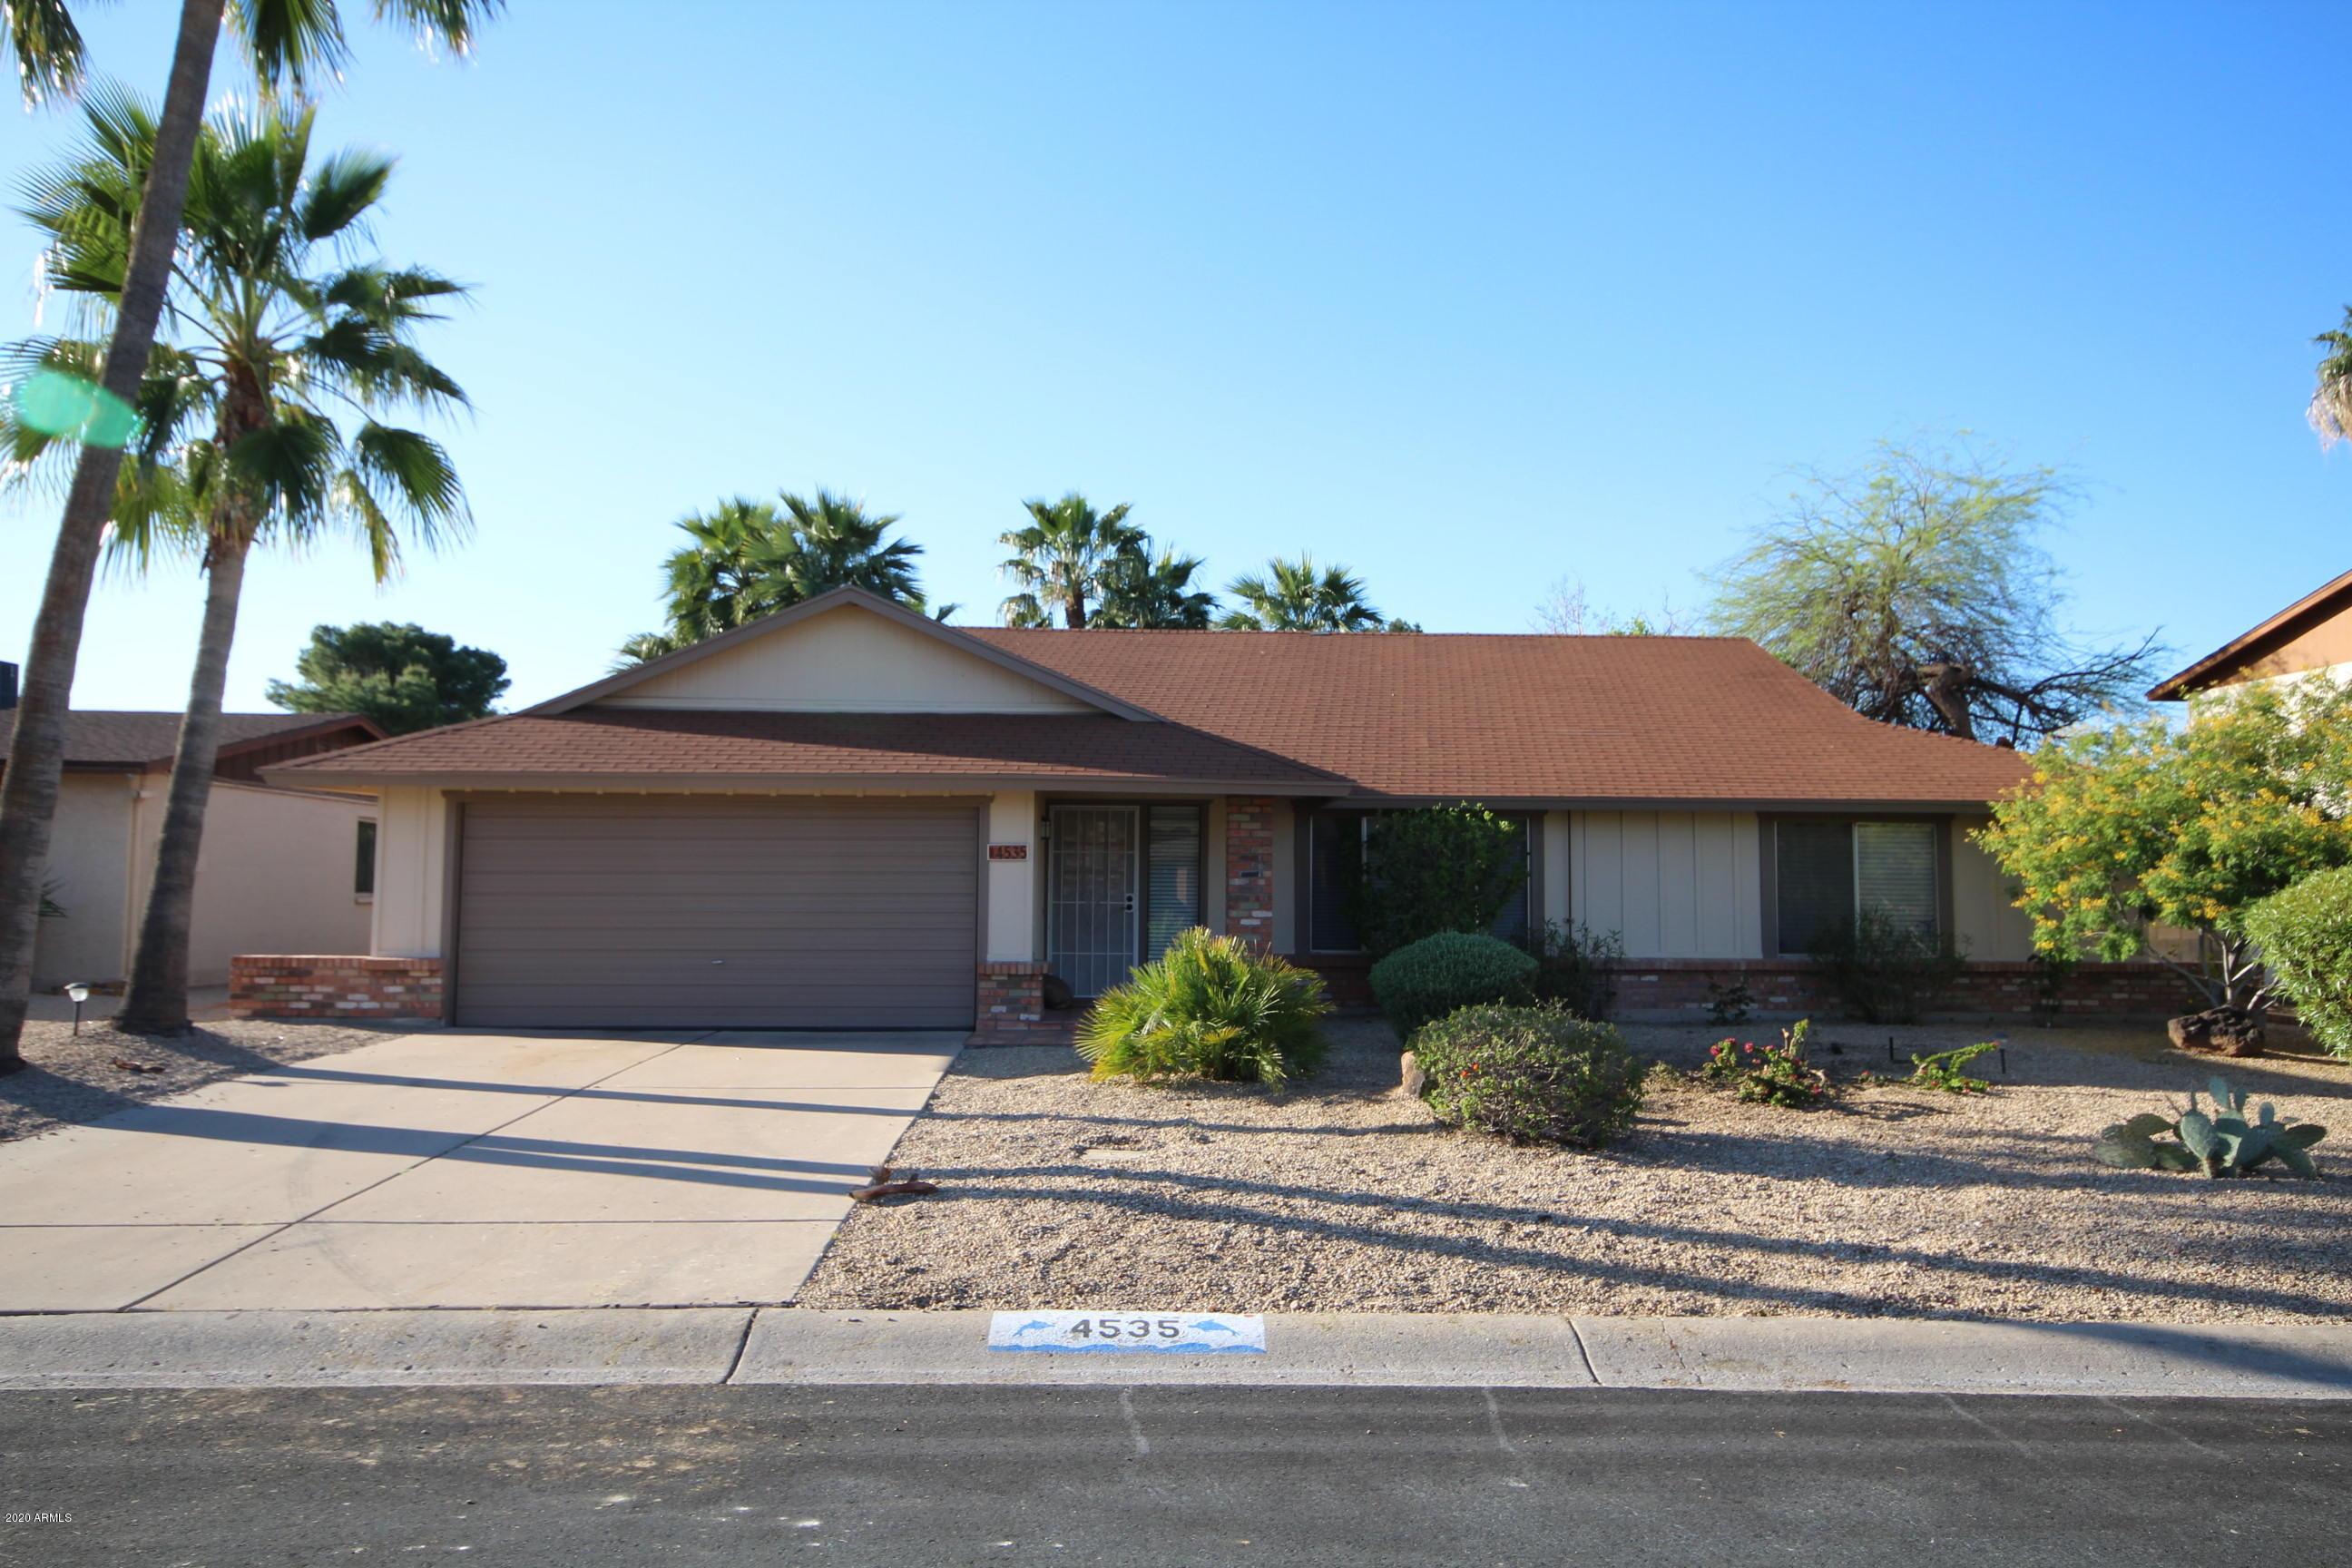 Photo of 4535 W BLUEFIELD Avenue, Glendale, AZ 85308